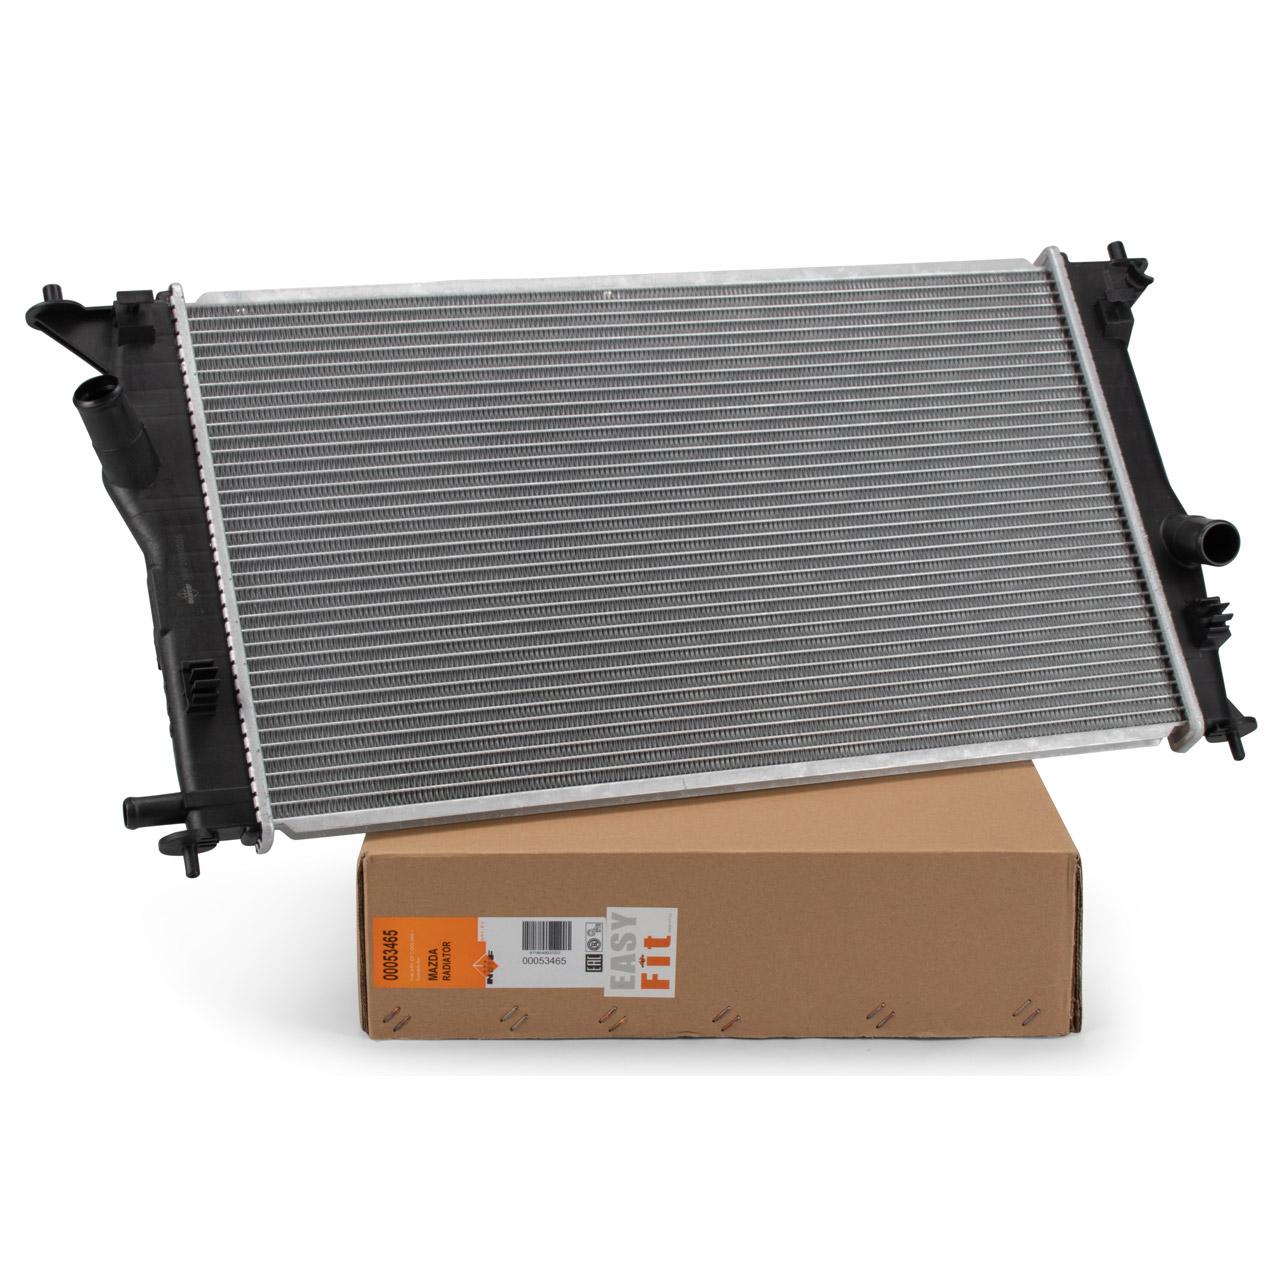 NRF 53465 Kühler Motorkühler EASY FIT MAZDA 5 (CR19) 1.8 2.0 2.0 CD LFB715200A